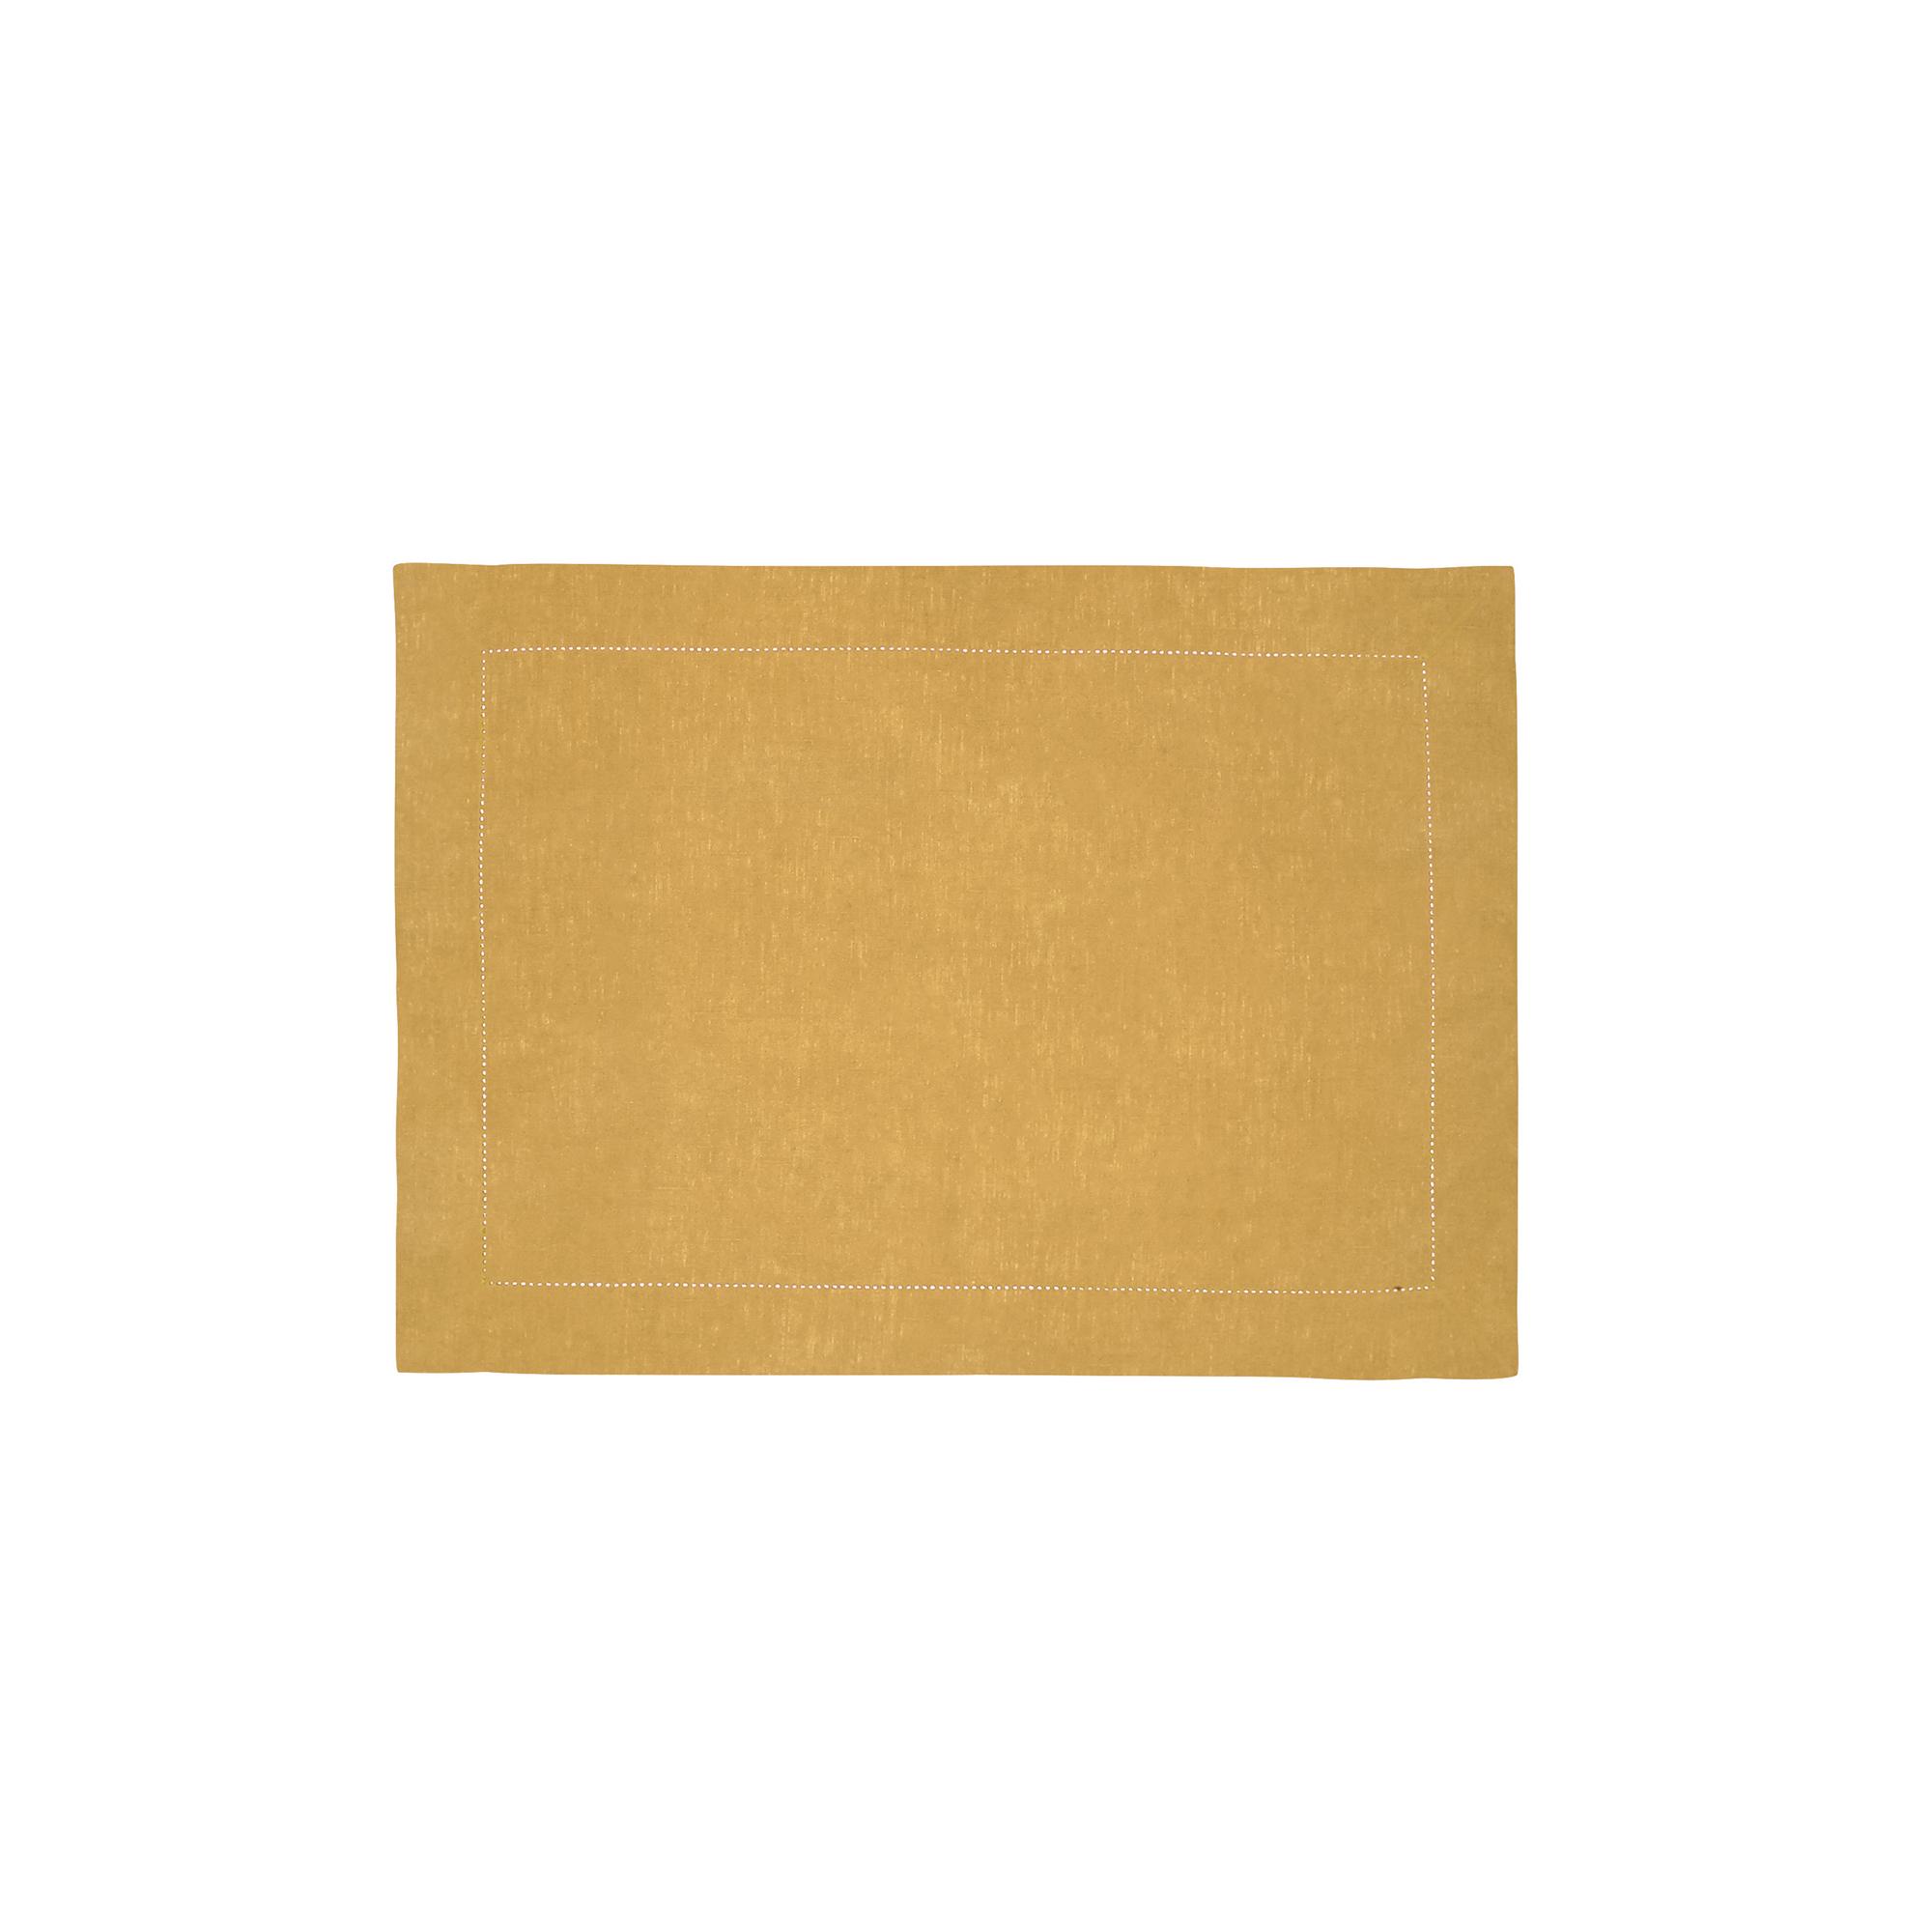 Set de table en lin jaune 37x50